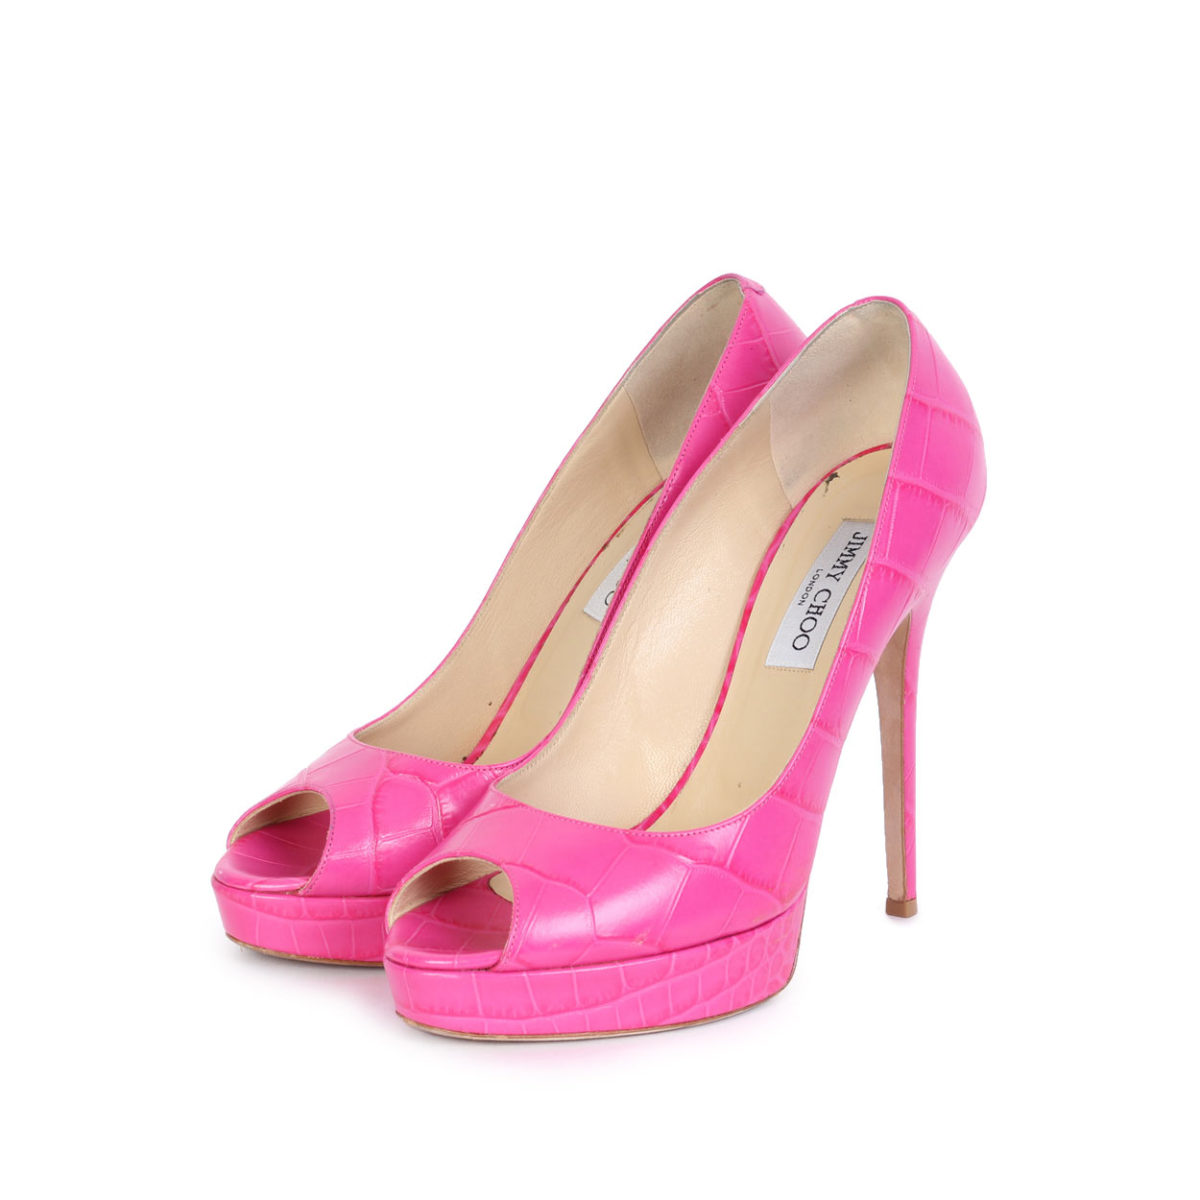 8e78cccb340 JIMMY CHOO Croc Crown Platform Peep-Toe Pumps Pink – S  40 (6.5 ...